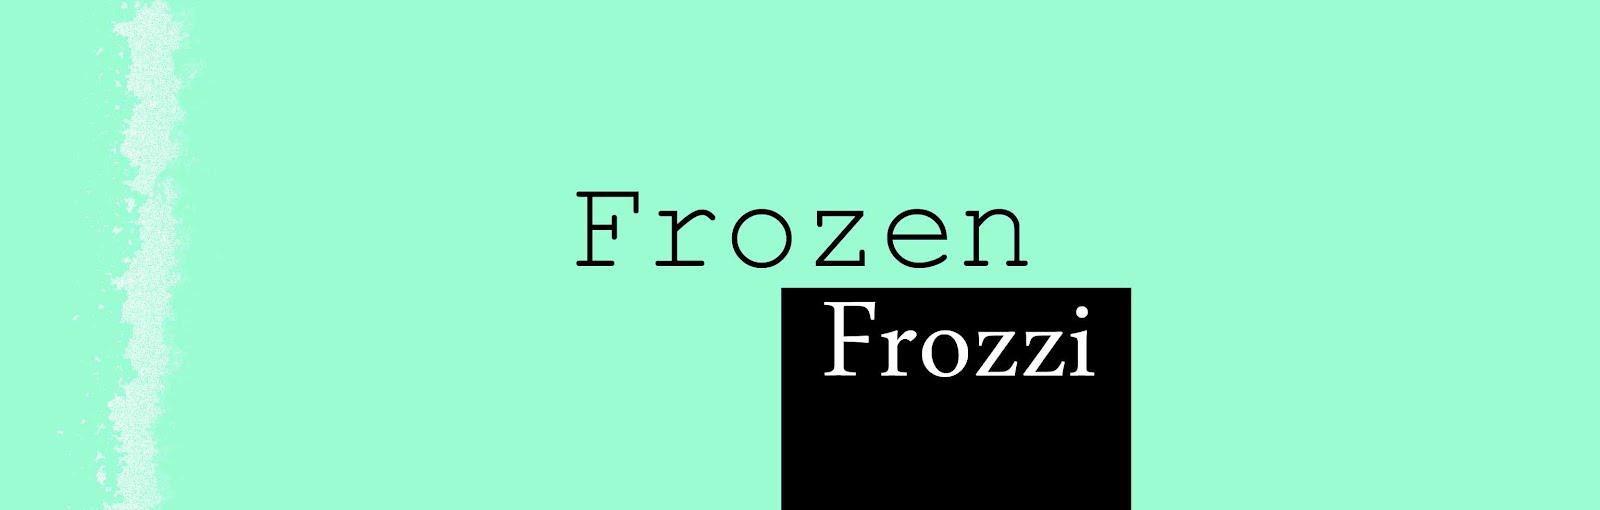 Frozen Frozzi